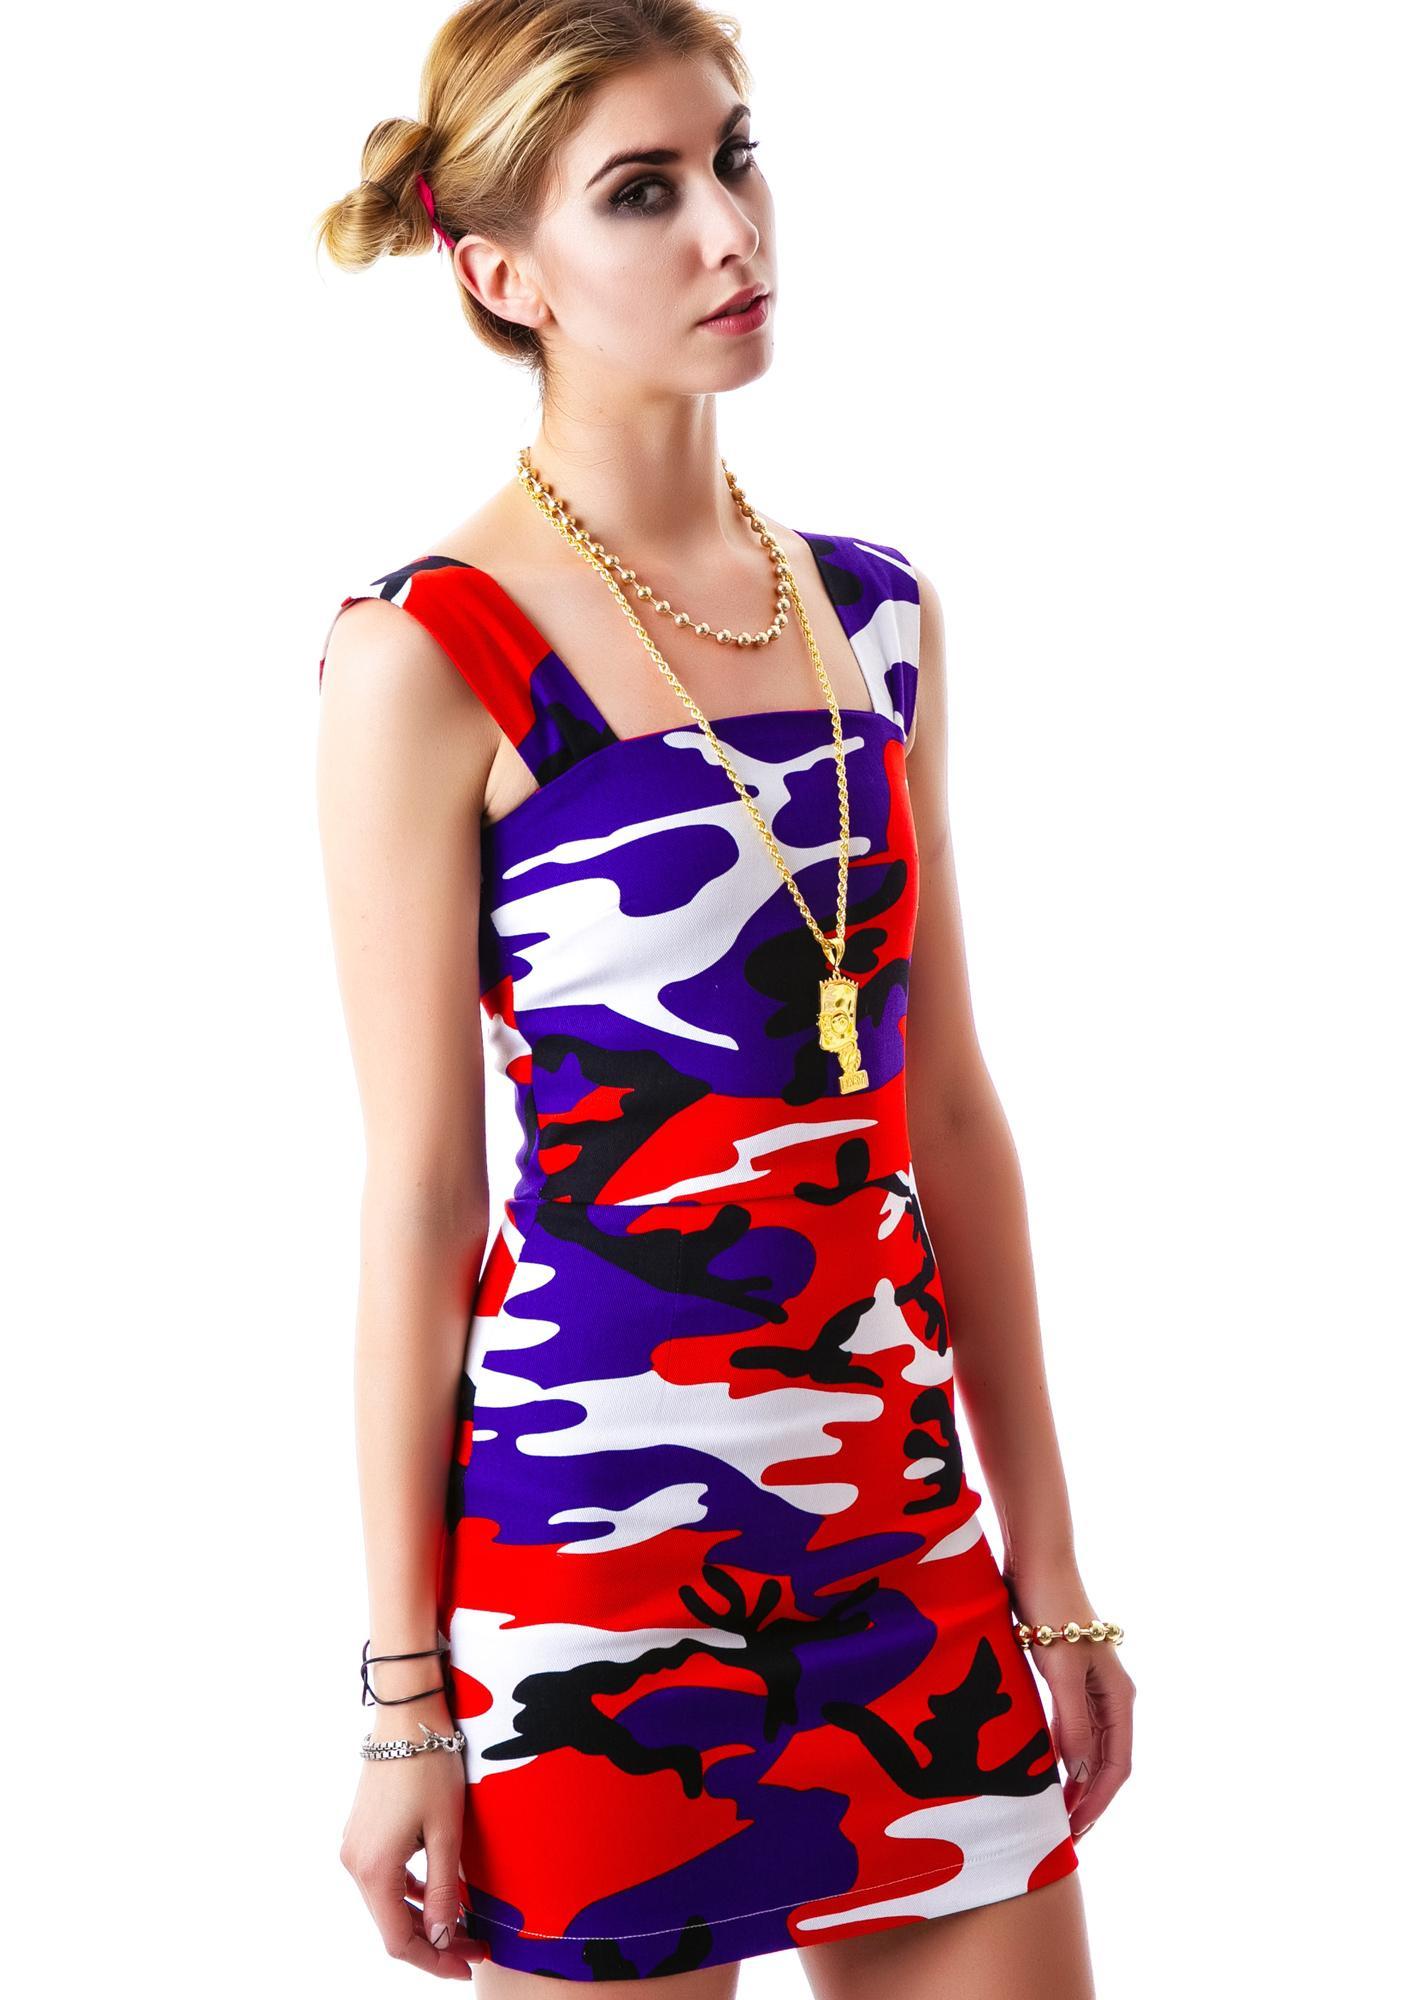 Joyrich Ocean Safari Tube Dress